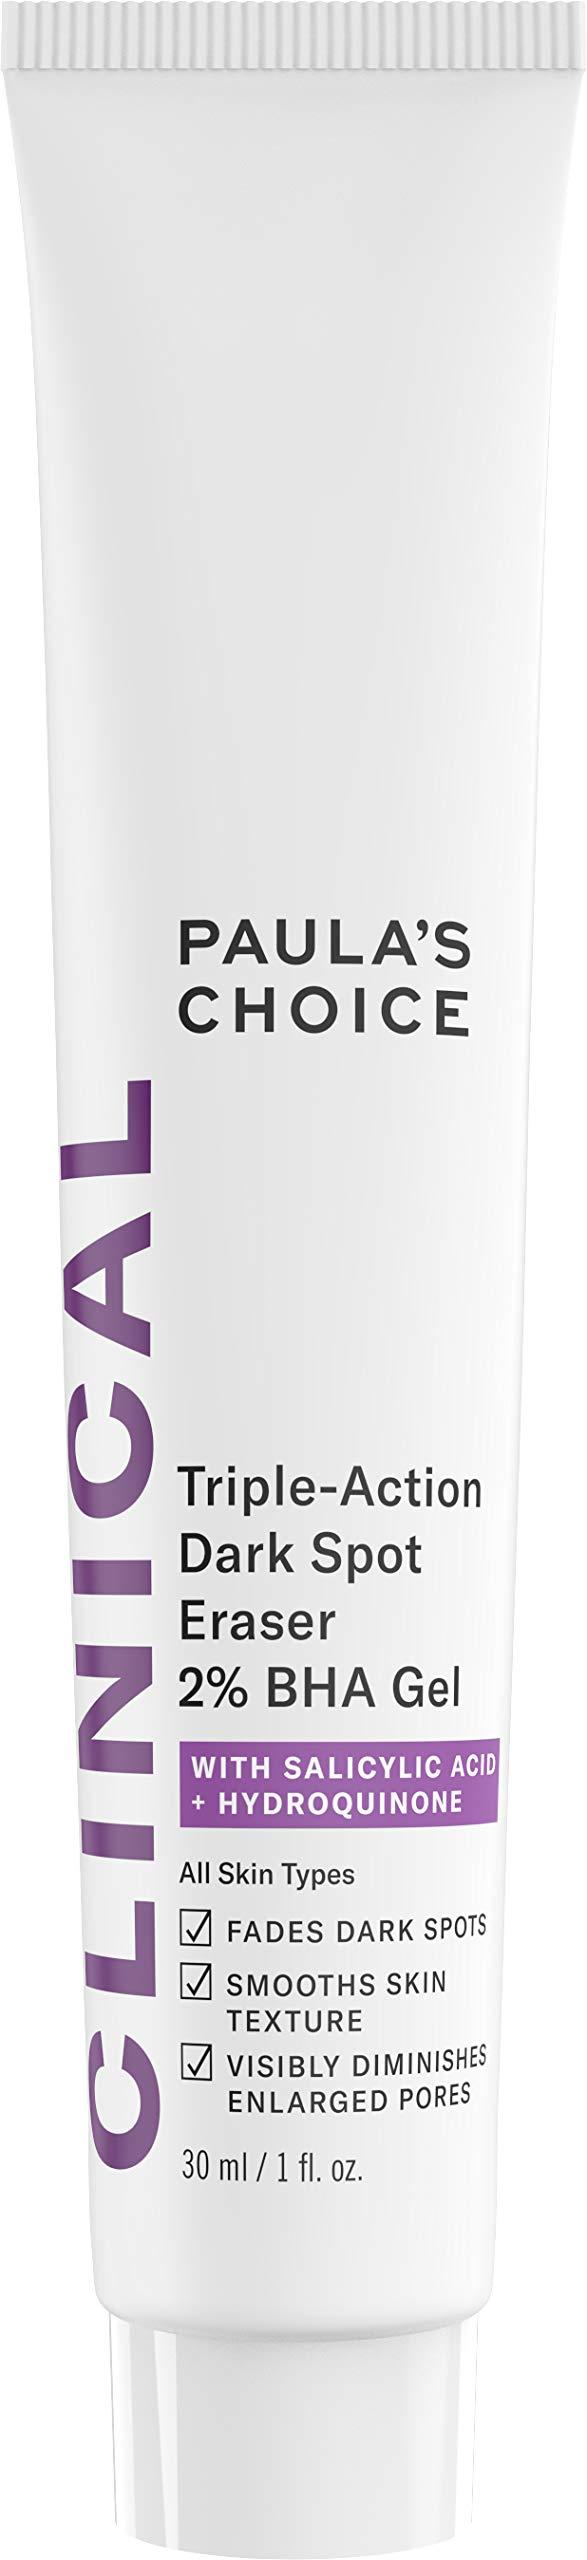 Paula's Choice CLINICAL Triple-Action Dark Spot Eraser 2% BHA Gel | Salicylic Acid & Hydroquinone | Hyperpigmentation & Skin Lightening | 1 Ounce